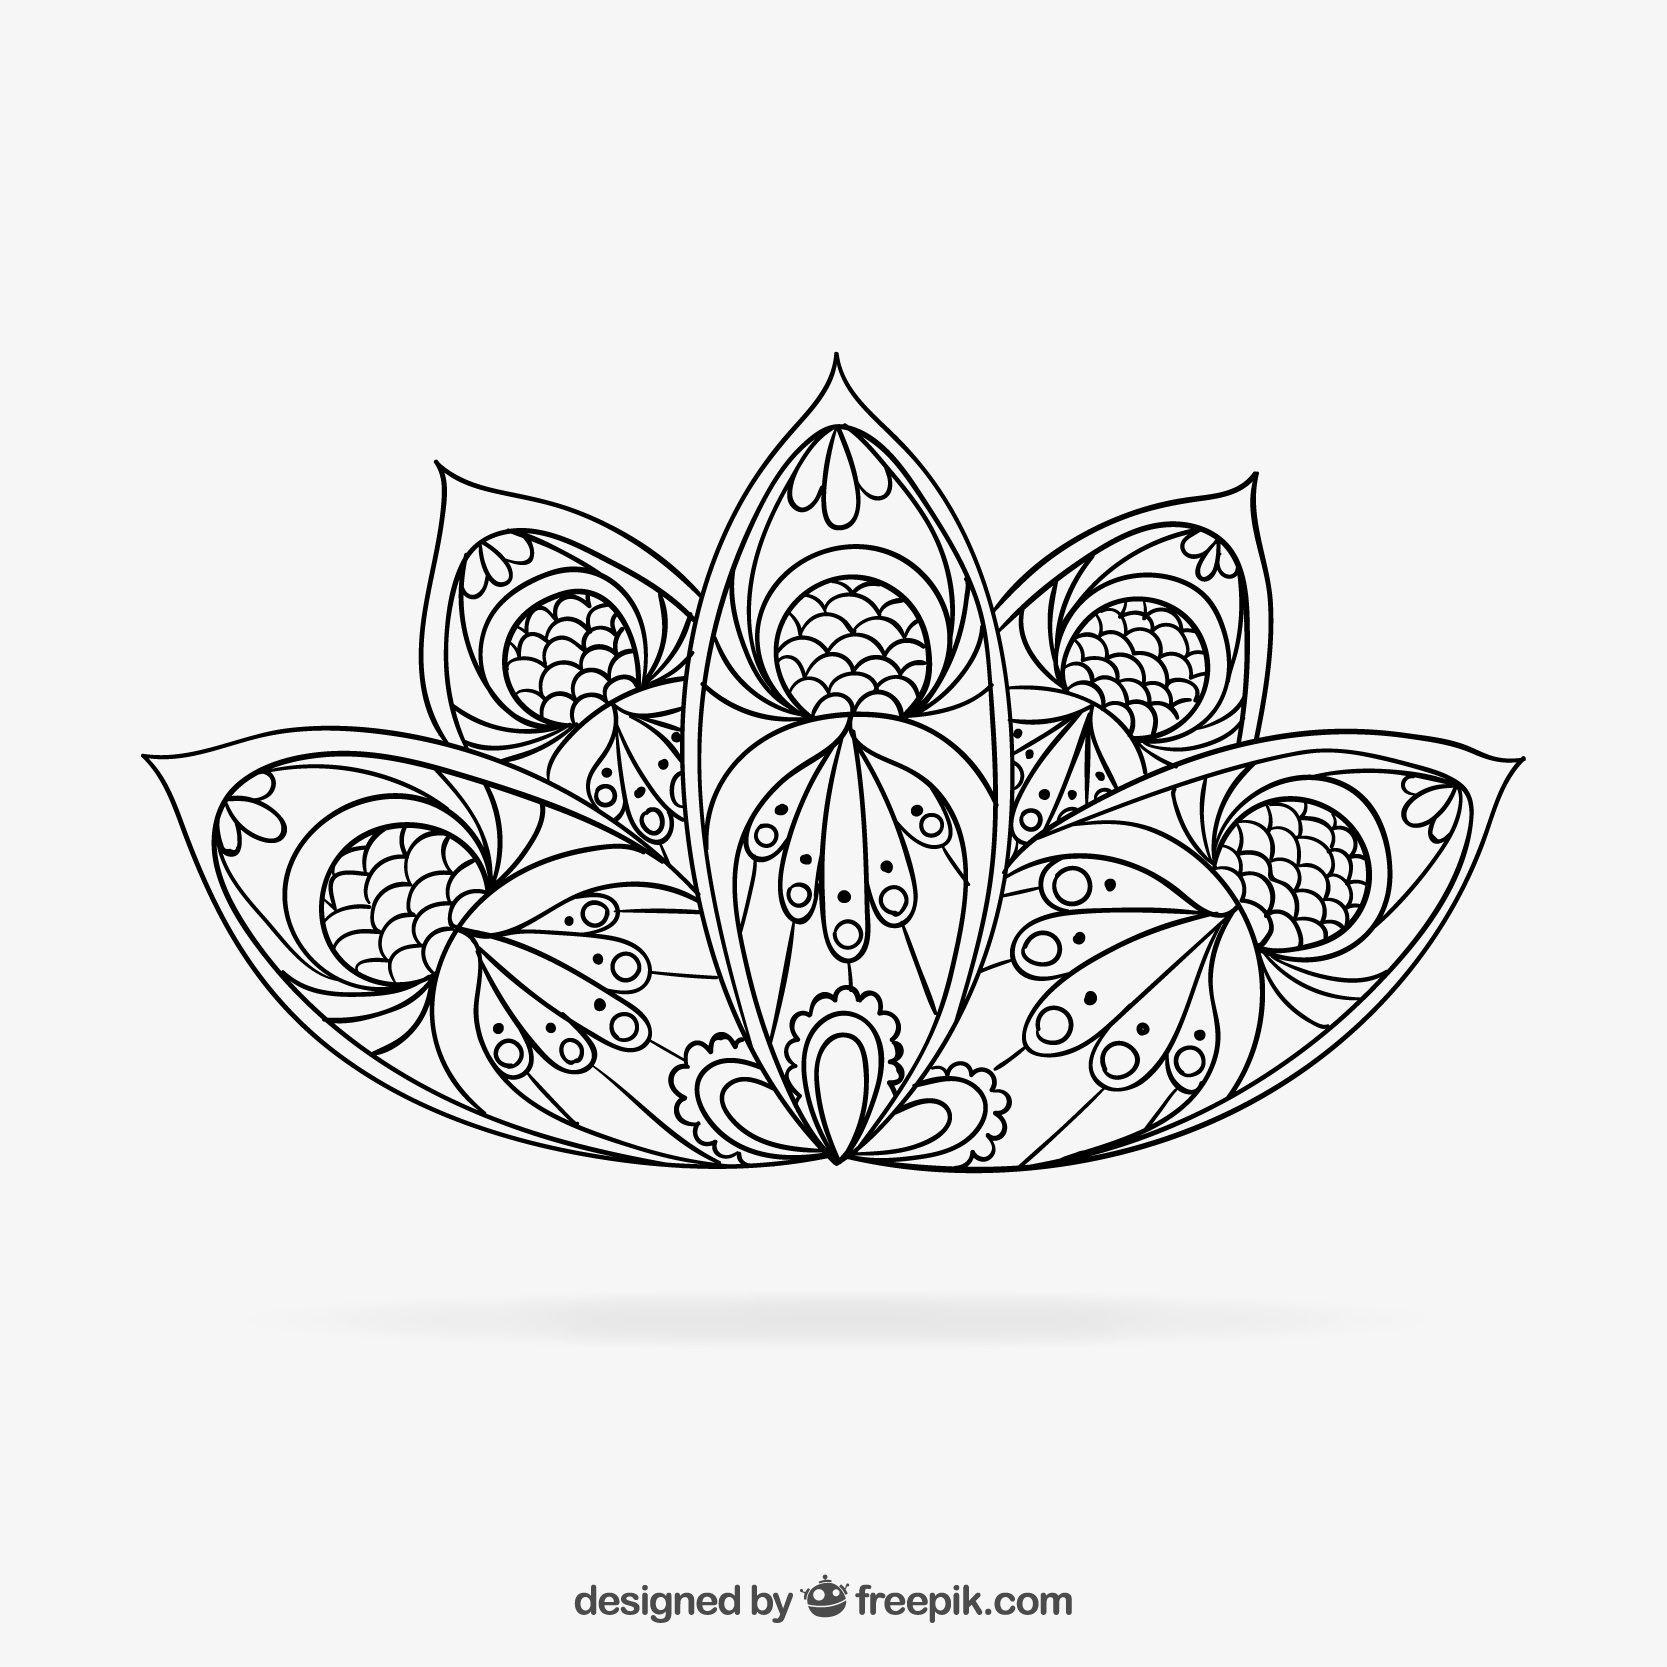 تلوين ماندالا للكبار برسم جاهز للطباعه How To Draw Hands Mandala Vector Mandala Drawing